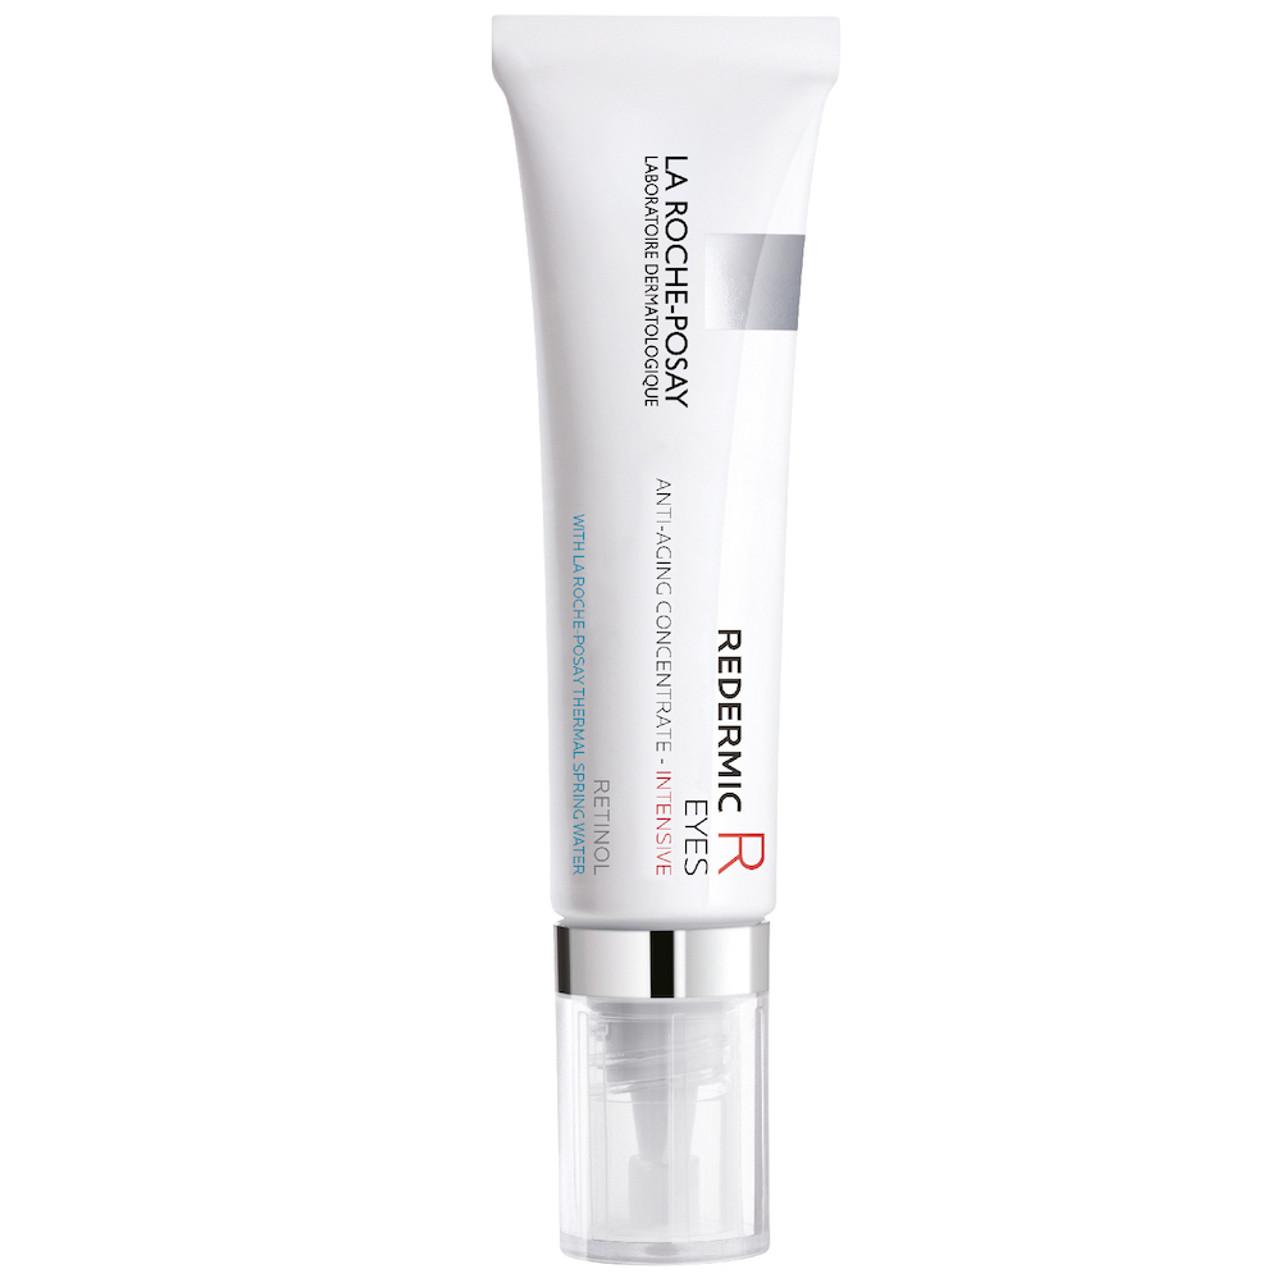 La Roche Posay Redermic [R] Eyes Retinol Eye Cream